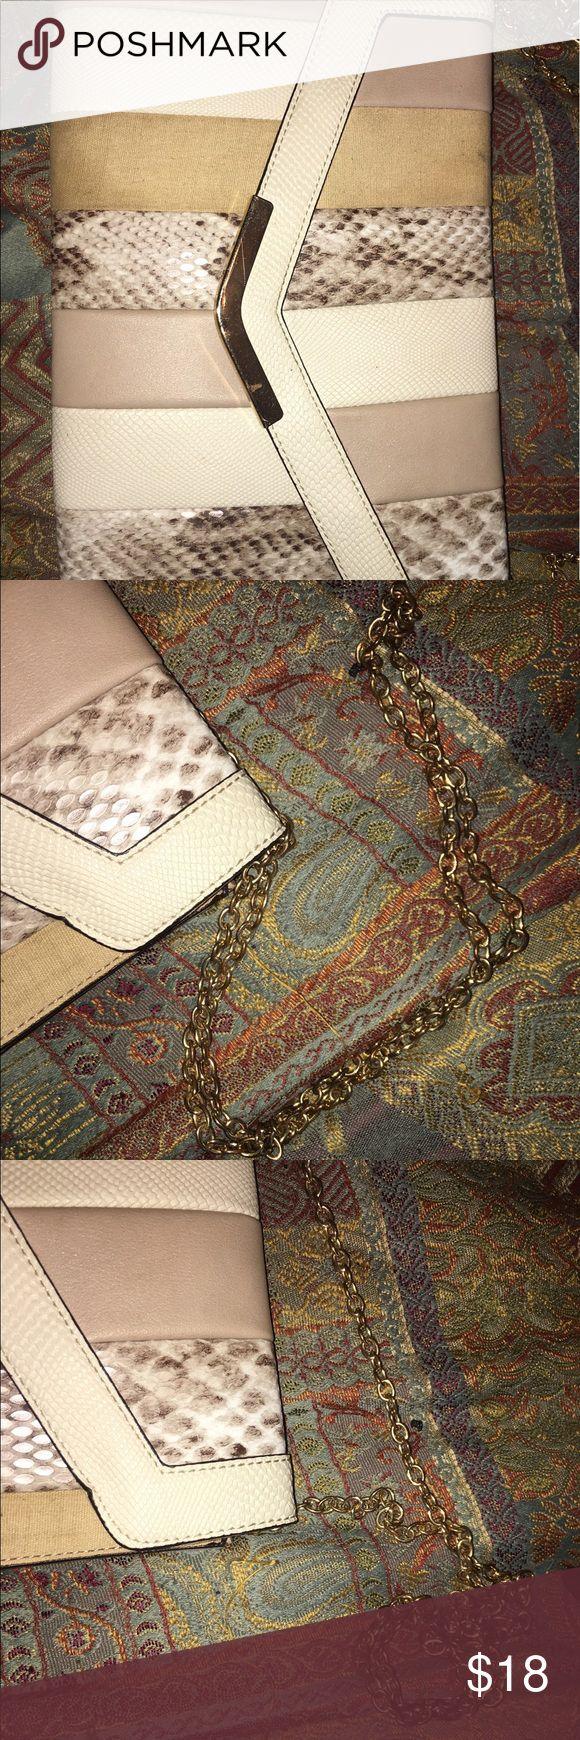 Stylish Beige Clutch w/ Chain Clutch from Aldo / No Damage / Worn Occasionally / Marks in Inside Of Bag / Aldo Bags Clutches & Wristlets